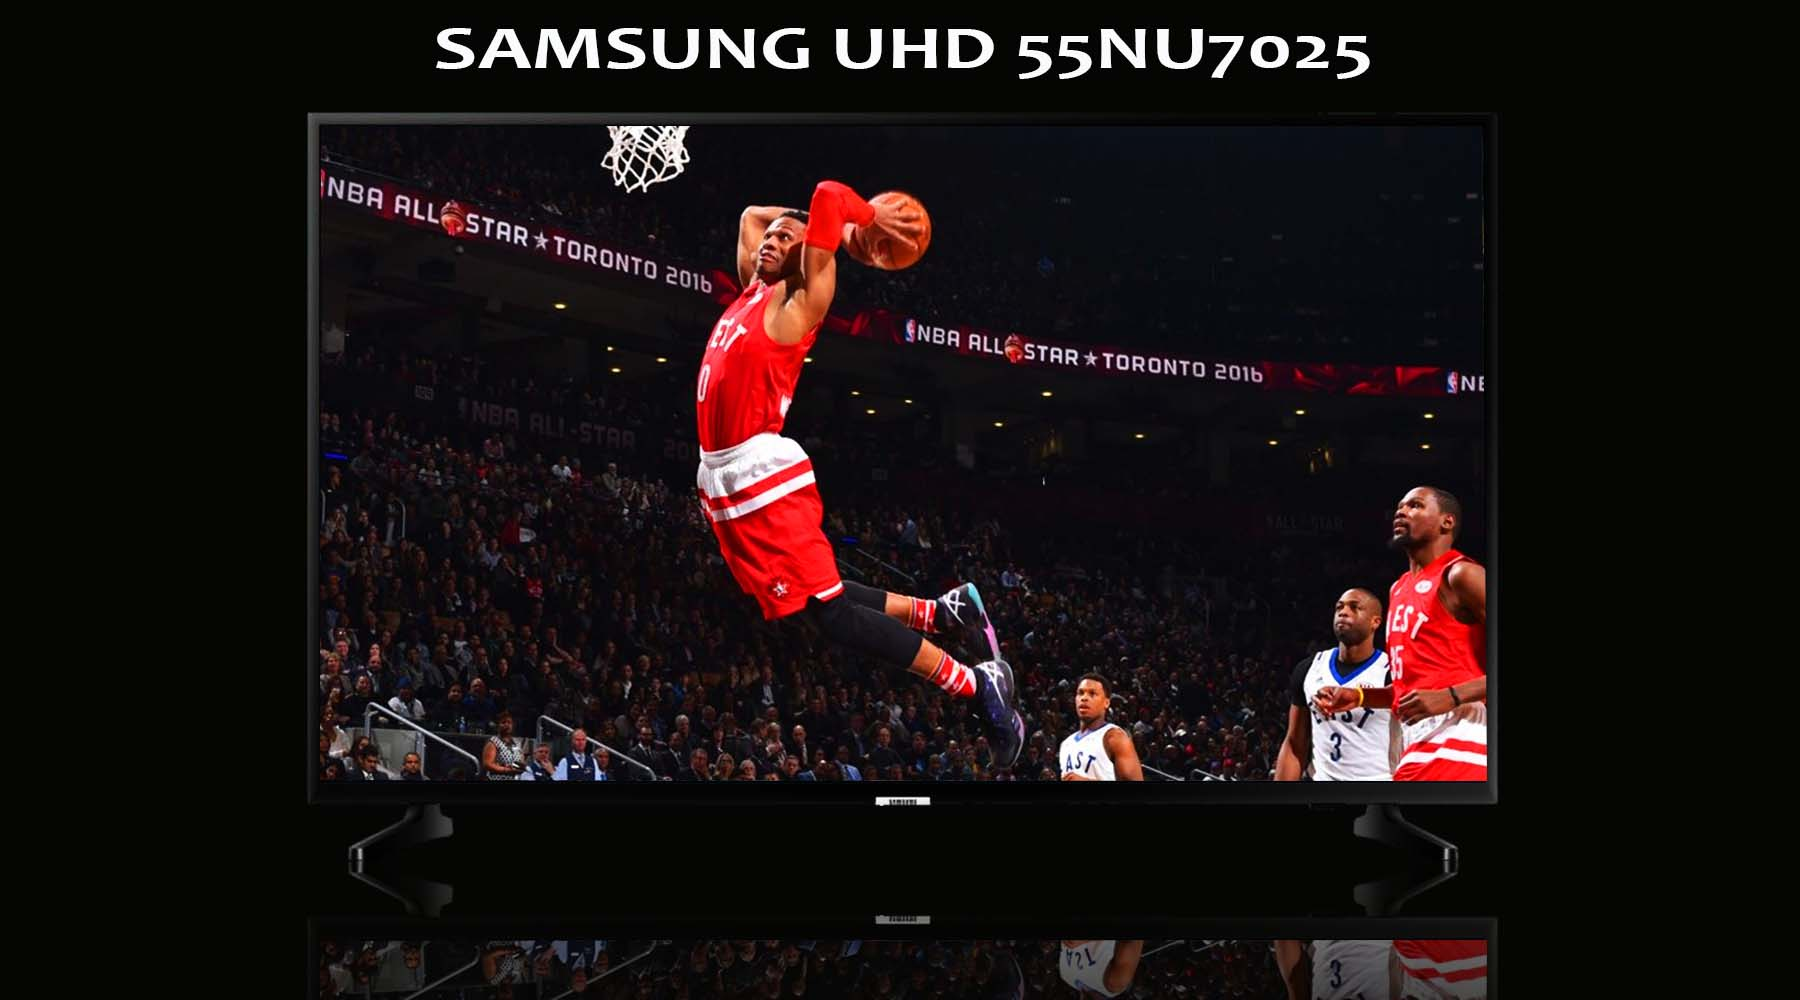 Samsung UHD 55NU7025